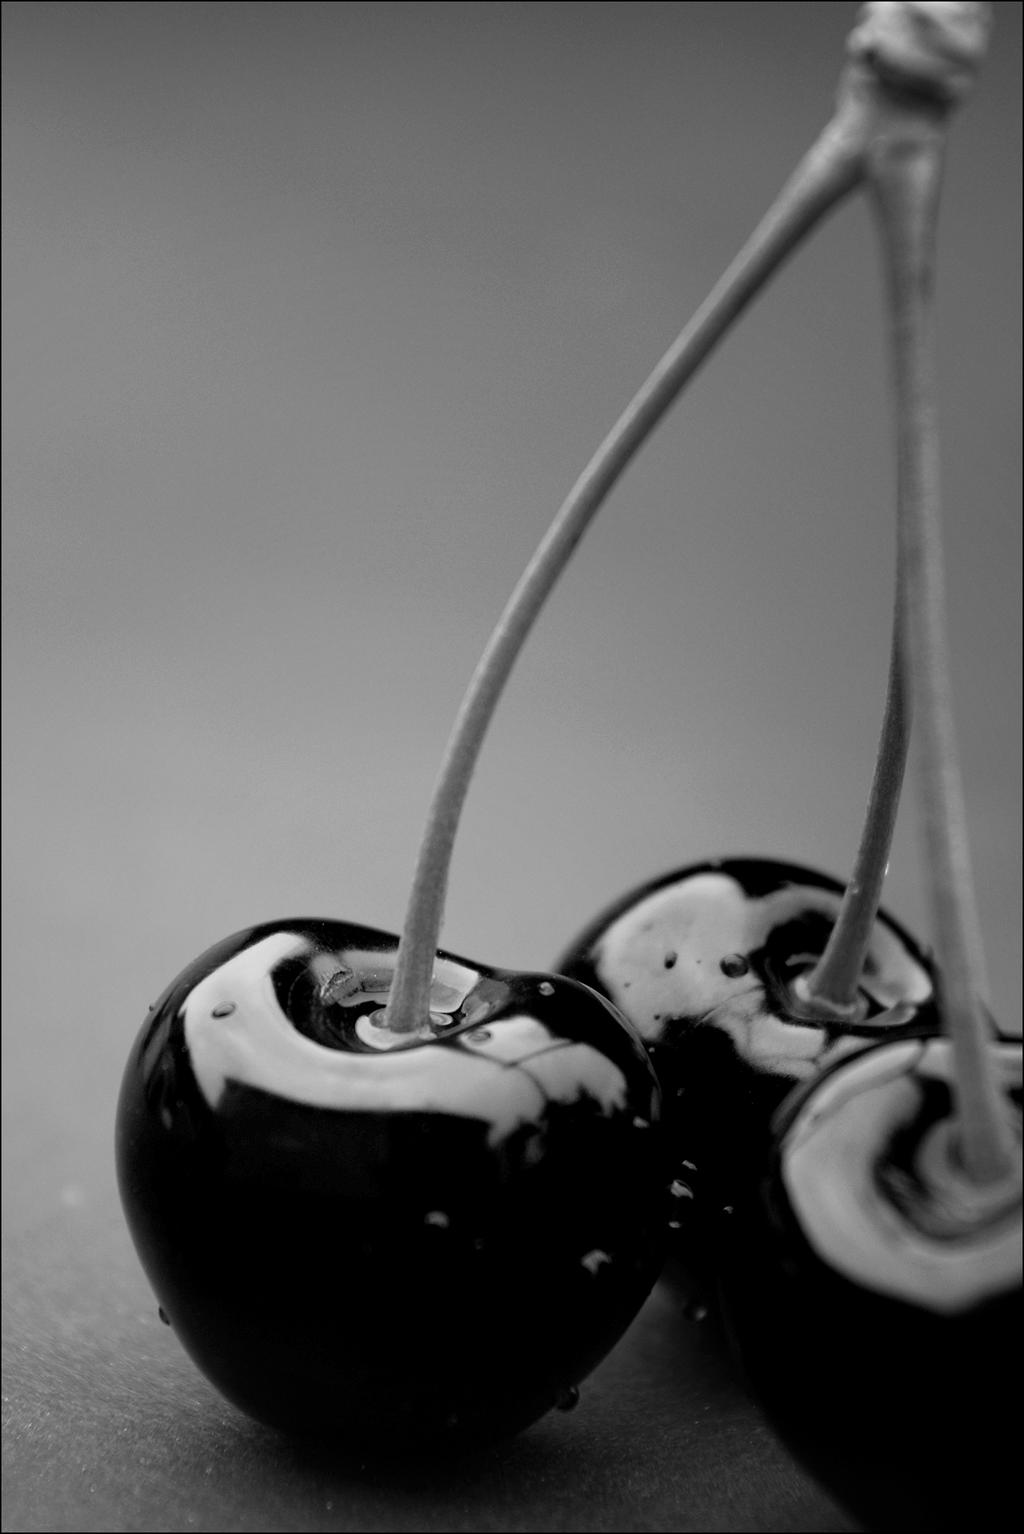 Cherry.1 by Cynamonium